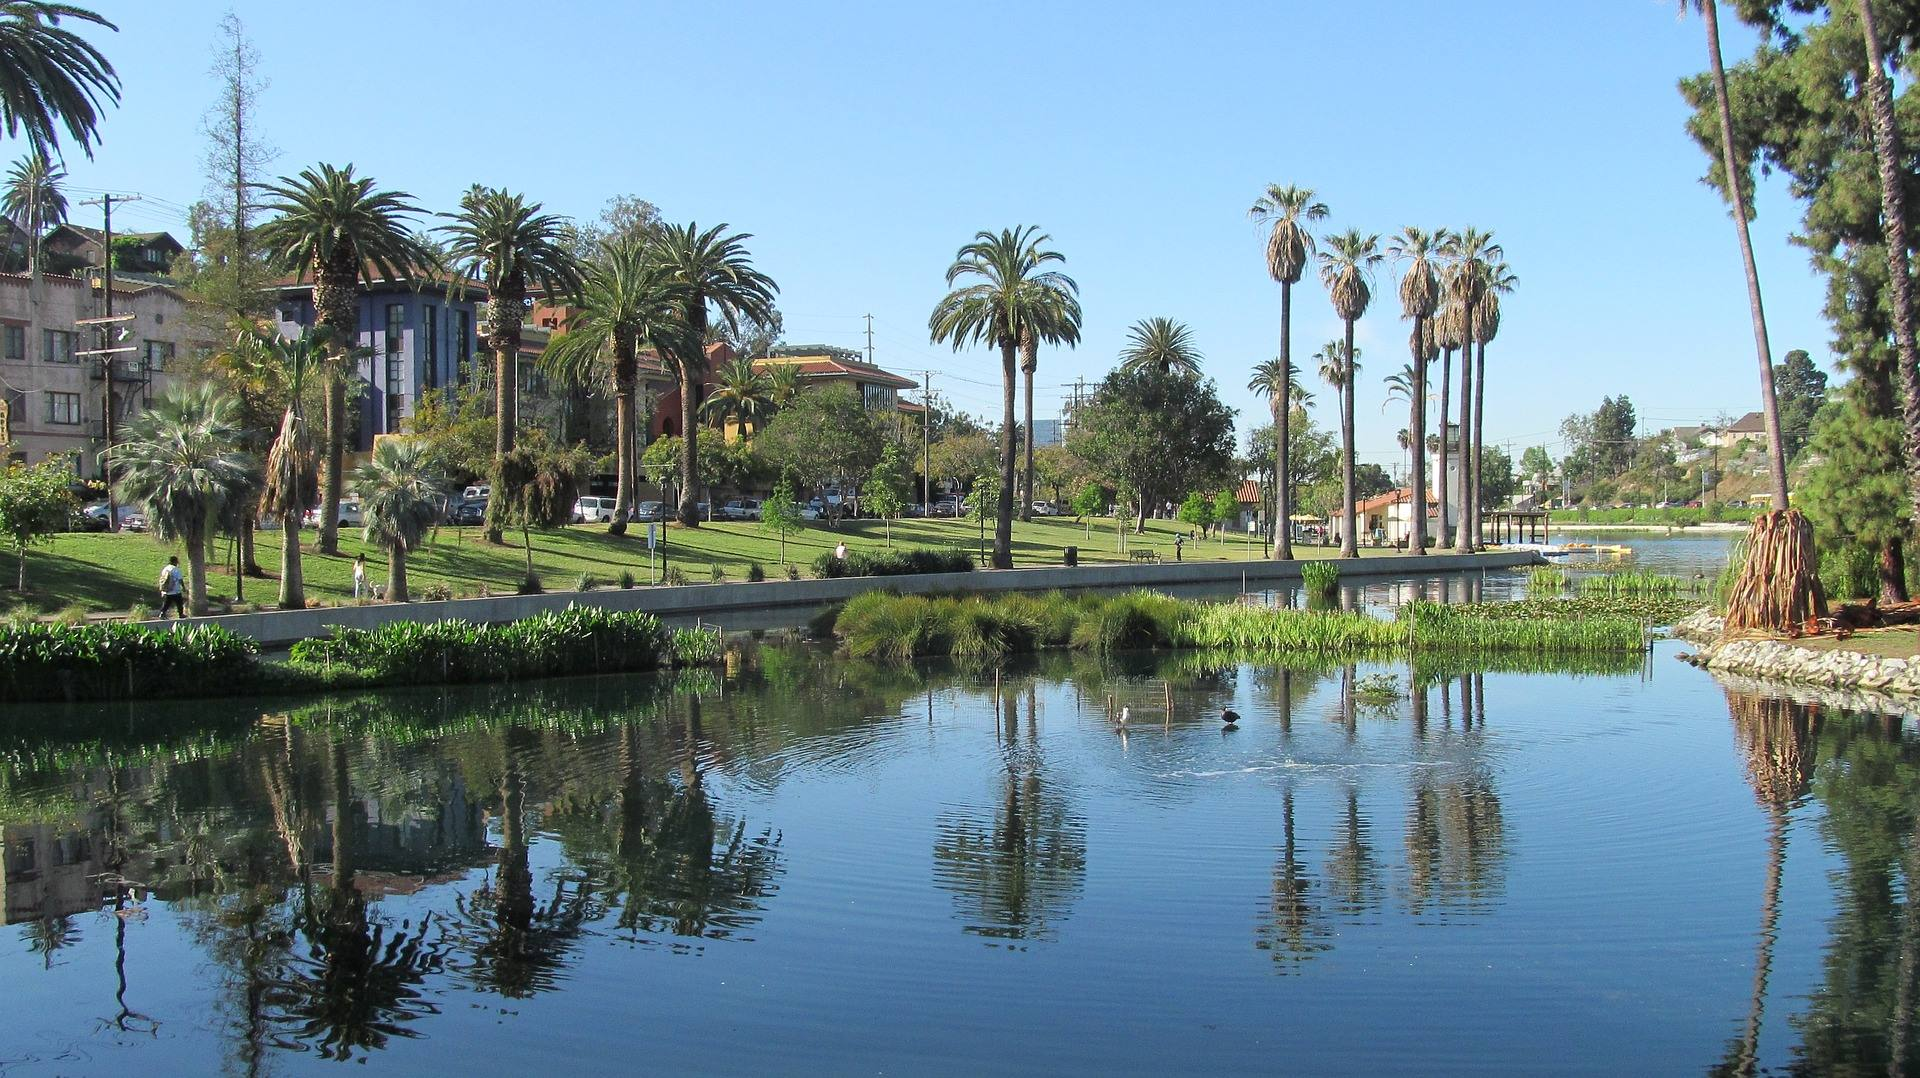 los angeles california echo park palm trees